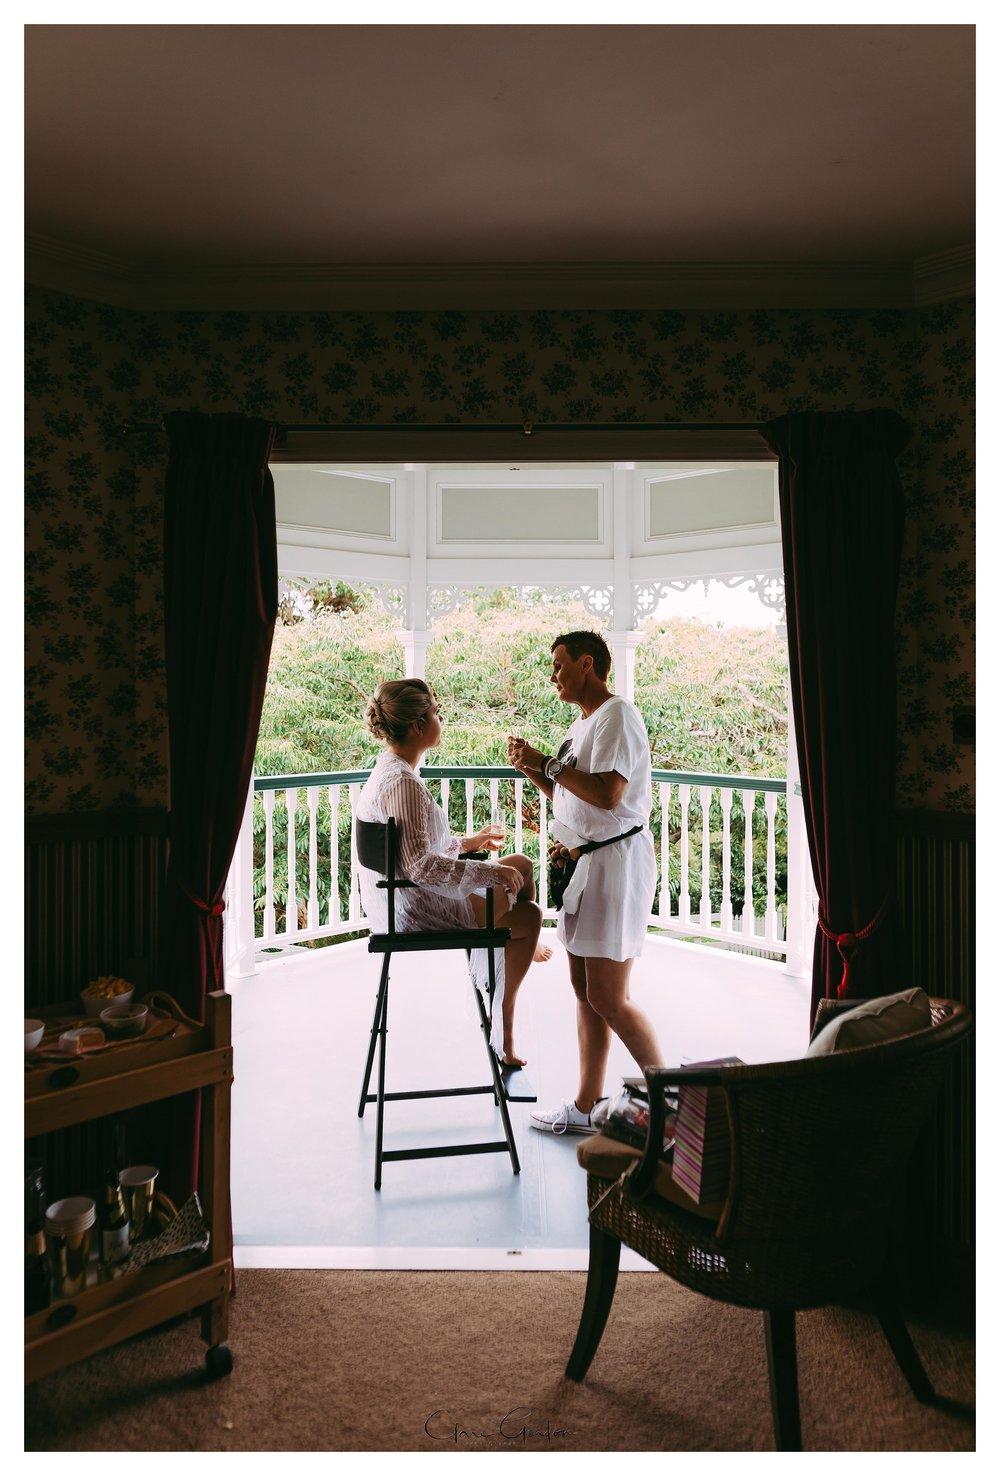 Charlemagne-Lodge-Tauranga-wedding-photo (17).jpg